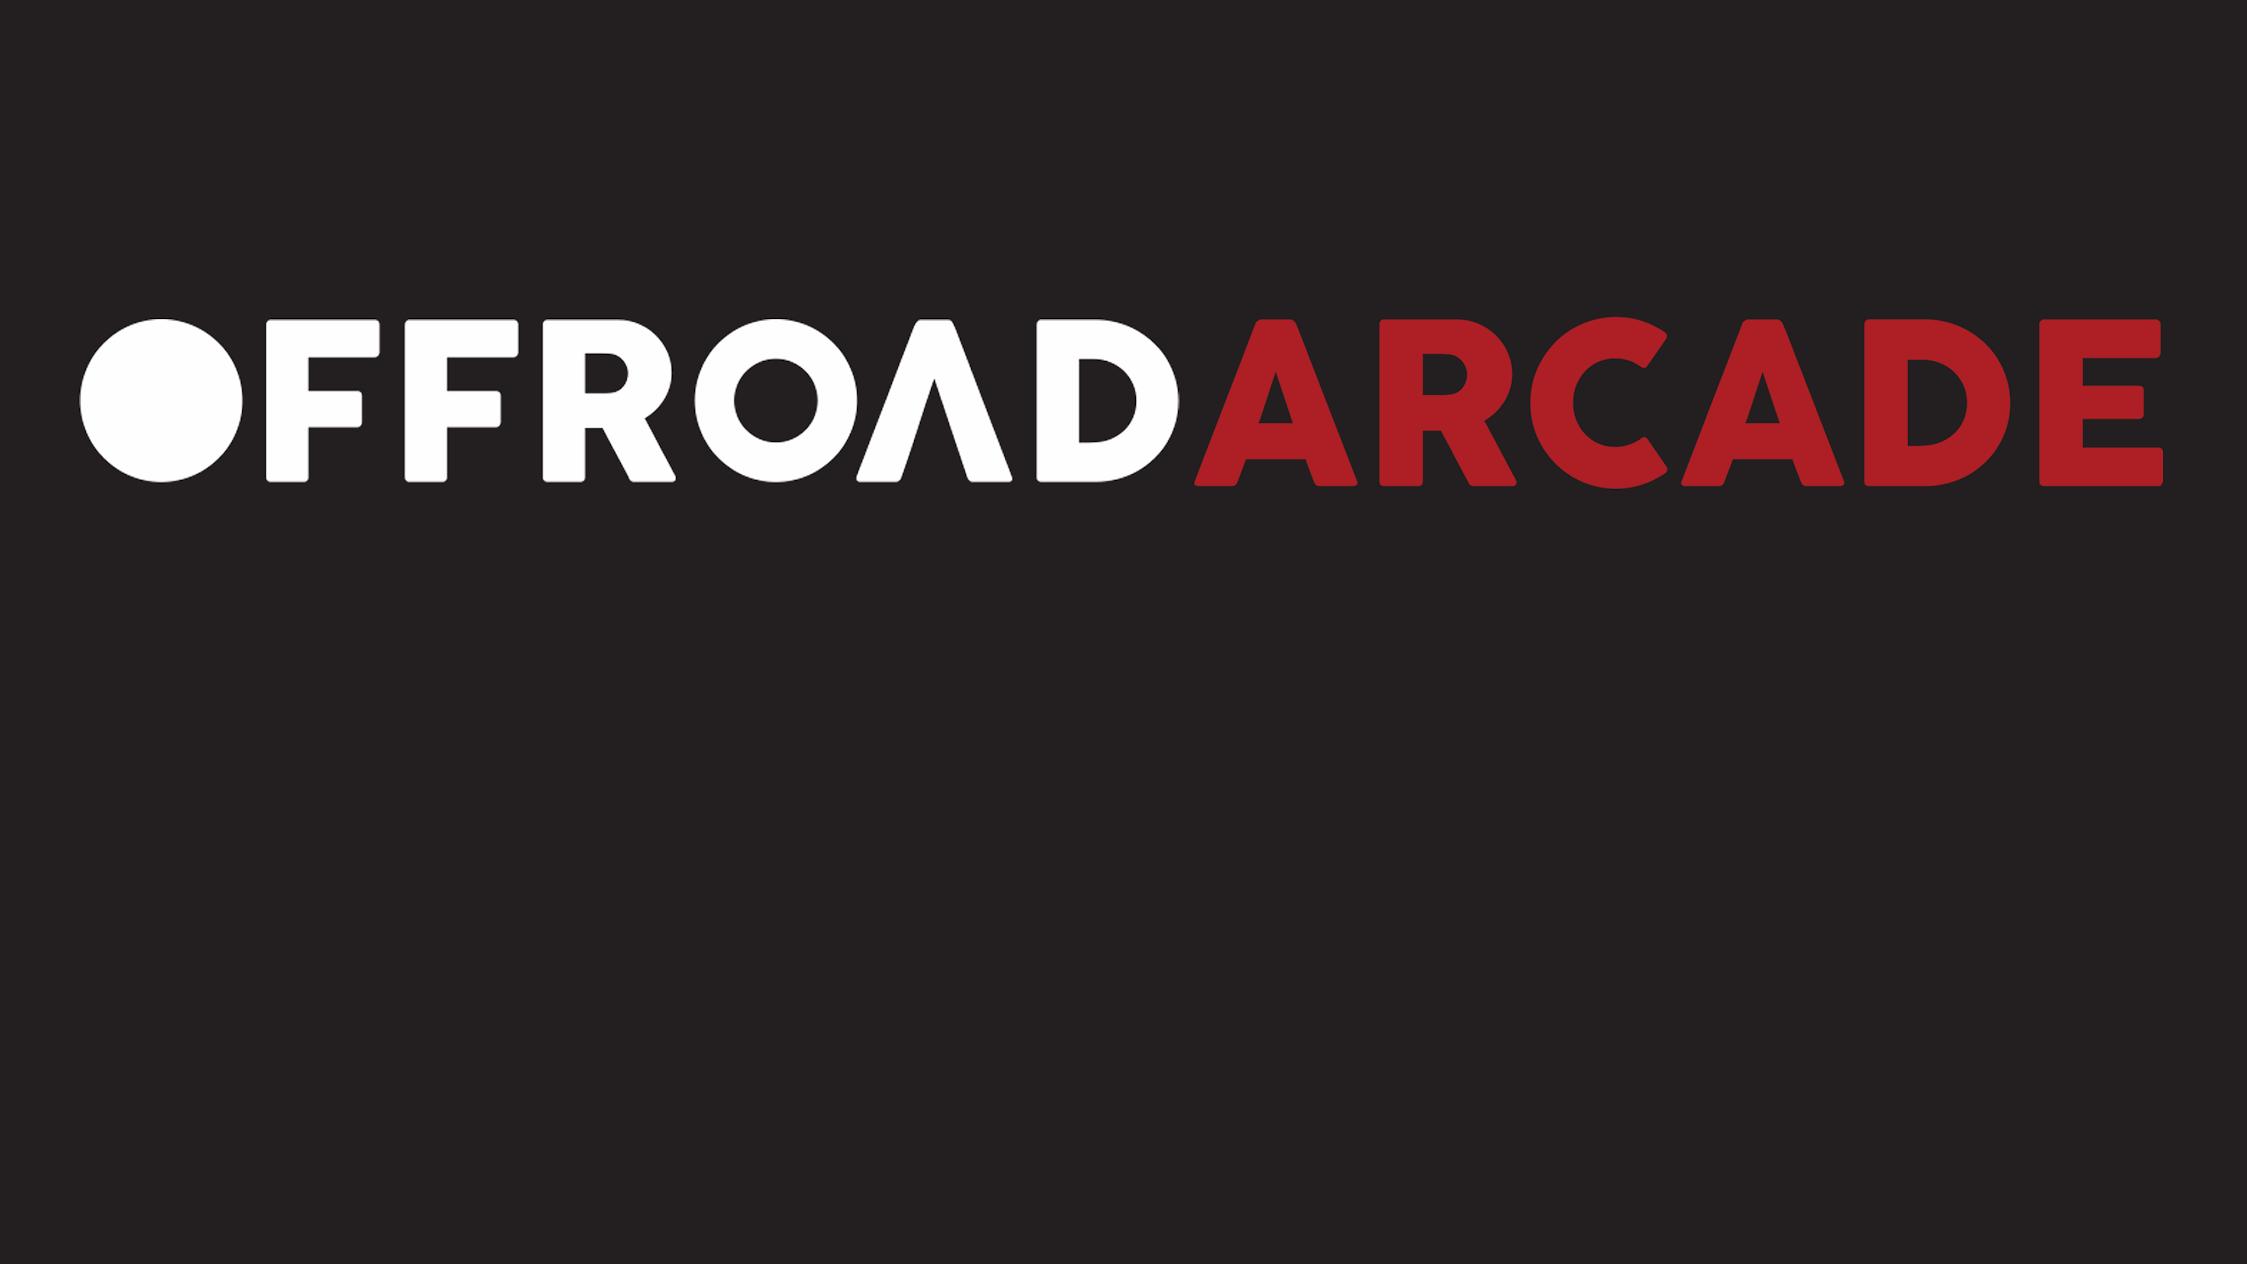 OffRoad Arcade